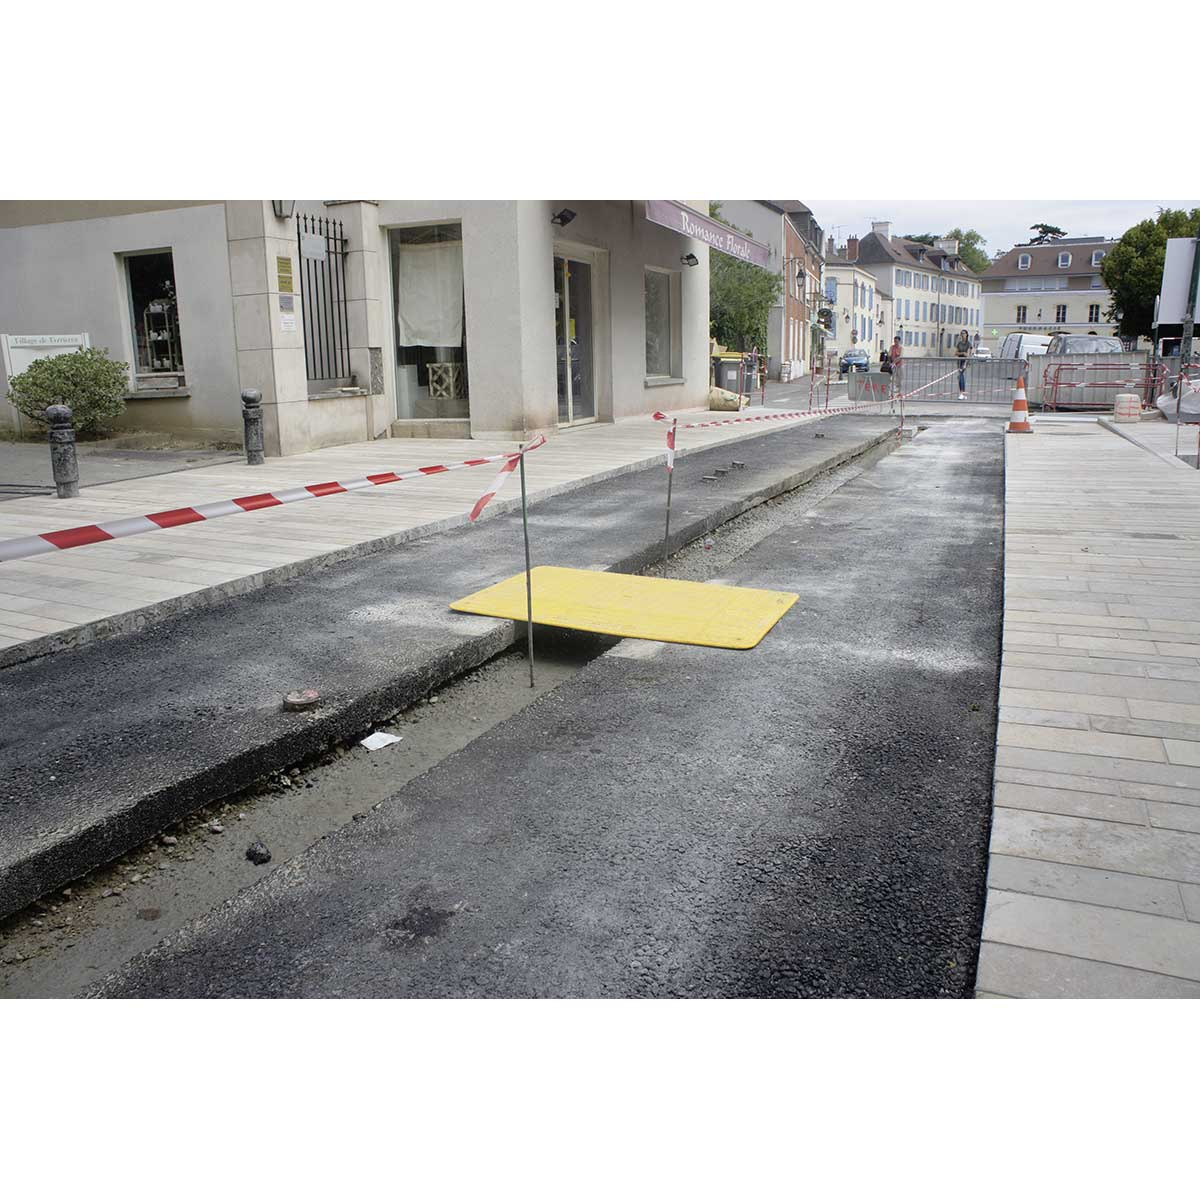 Rampa plástica con refuerzo metálico, para paso de fosos en obras públicas,